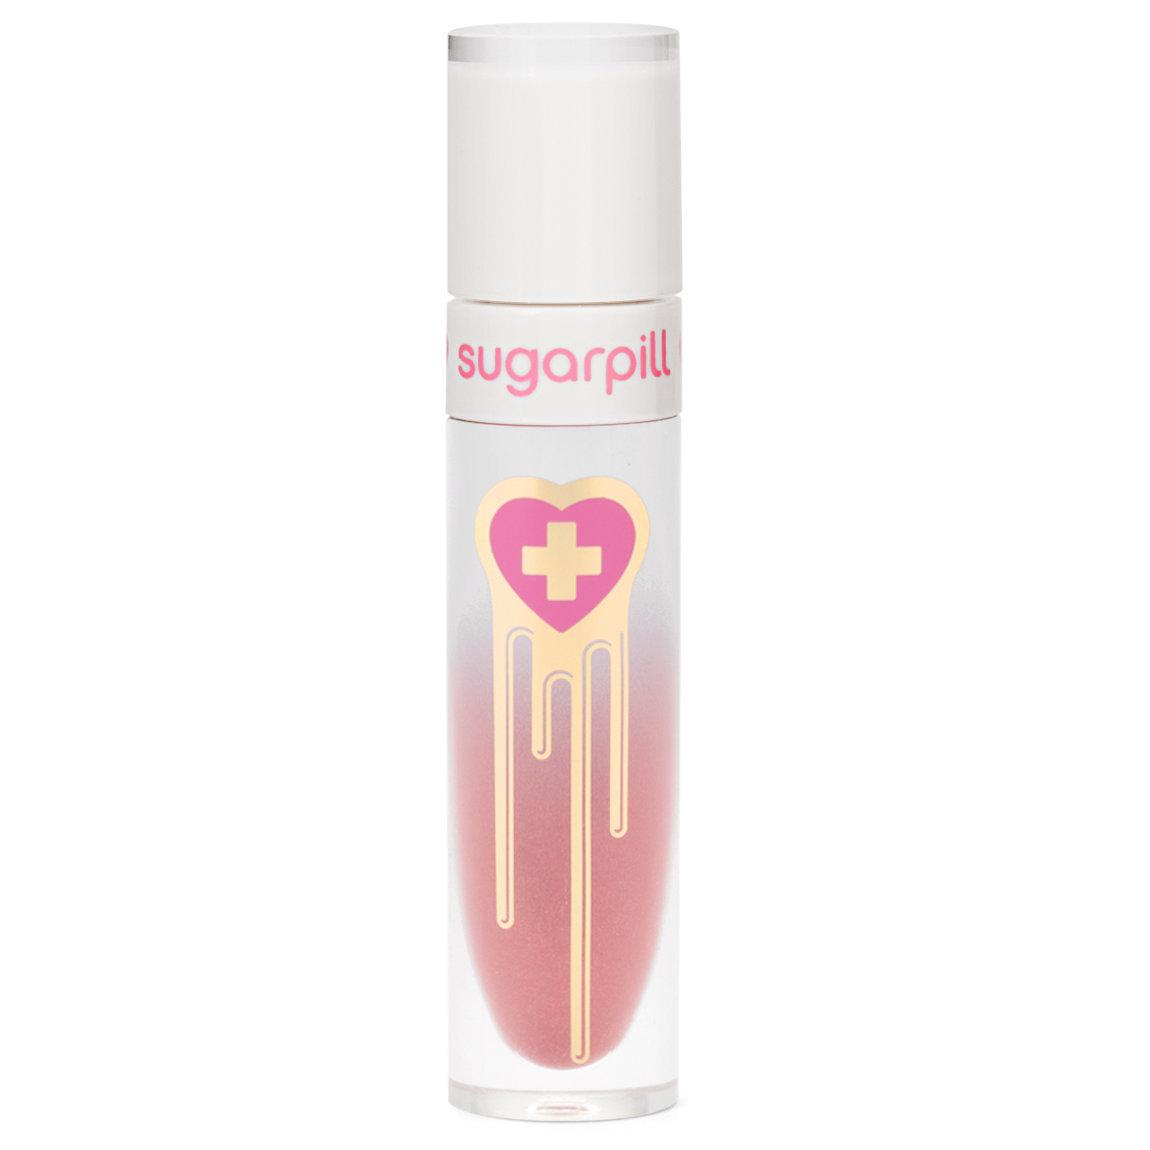 Sugarpill Cosmetics Liquid Lip Color Cherish product swatch.